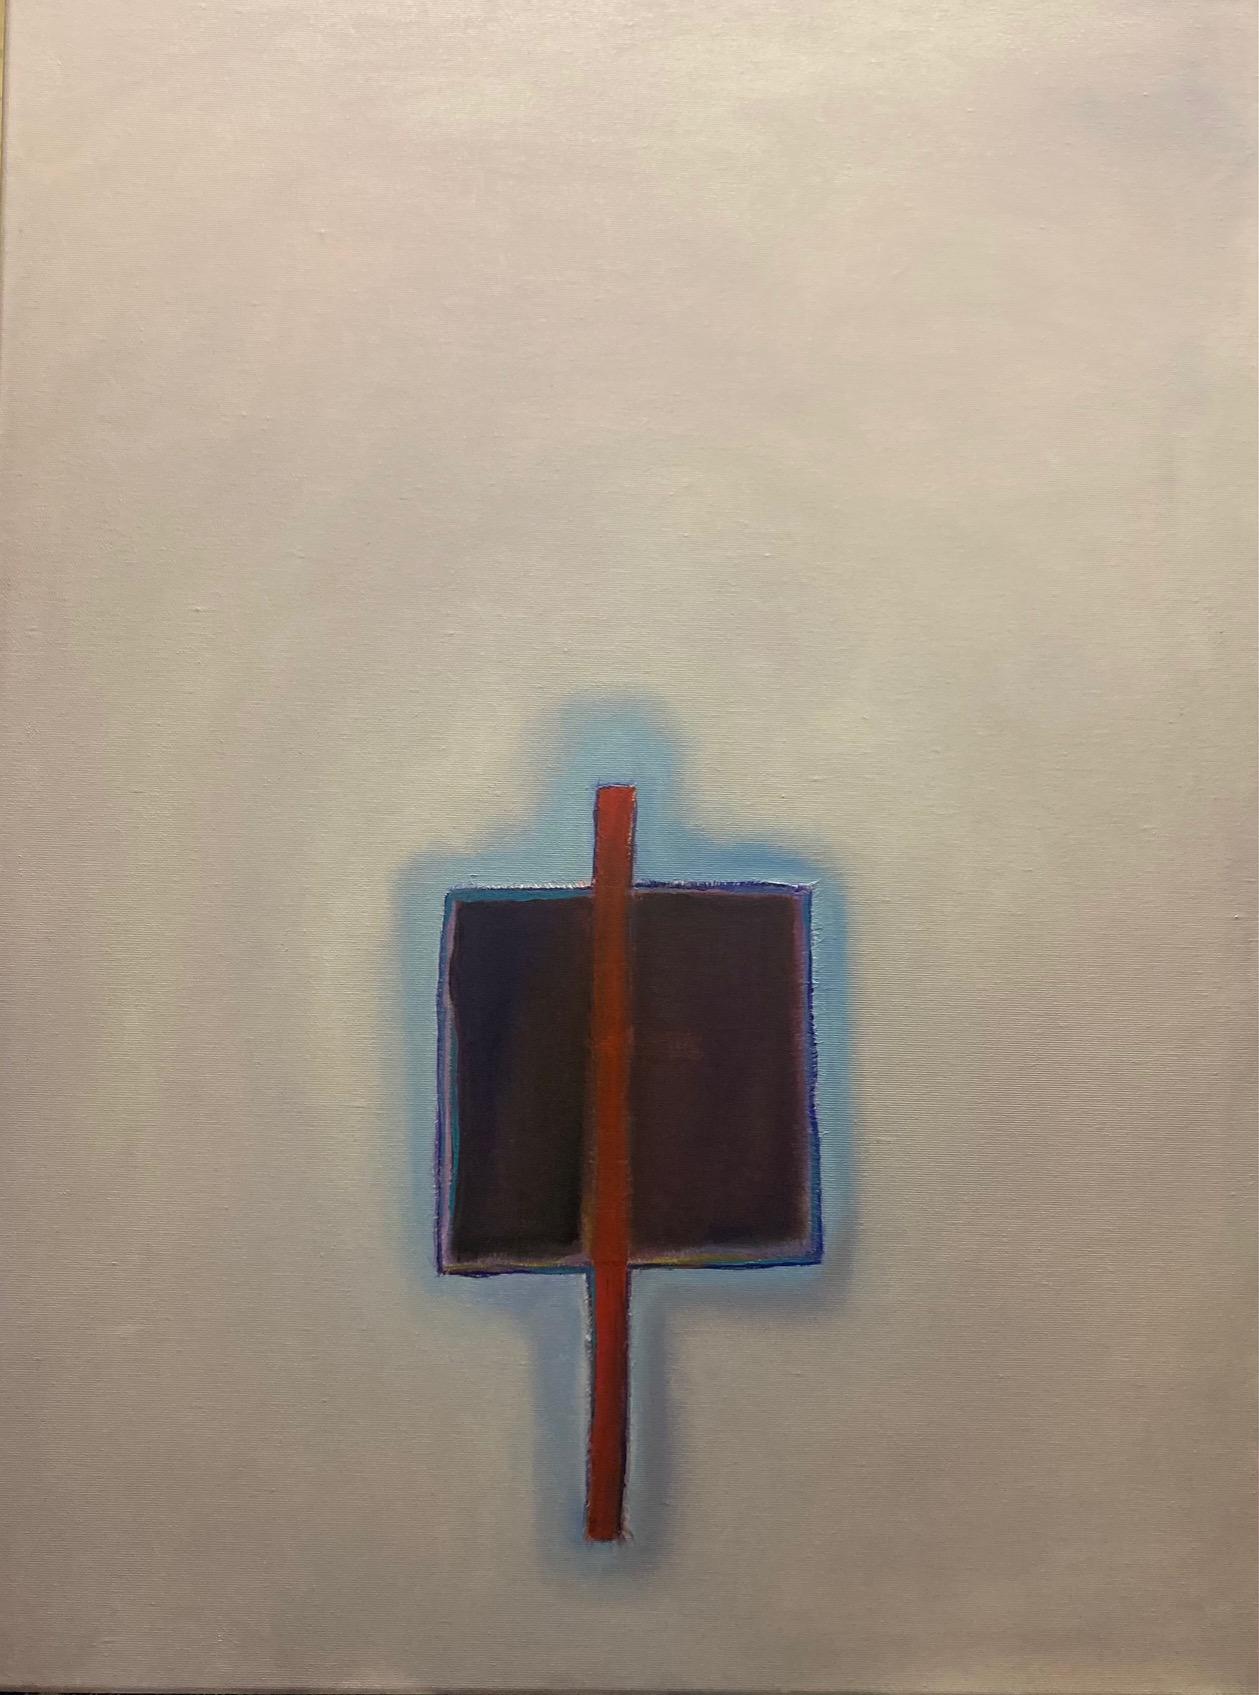 Silent Sign (7), Öl auf Leinwand, 80 x 60 cm, 2021